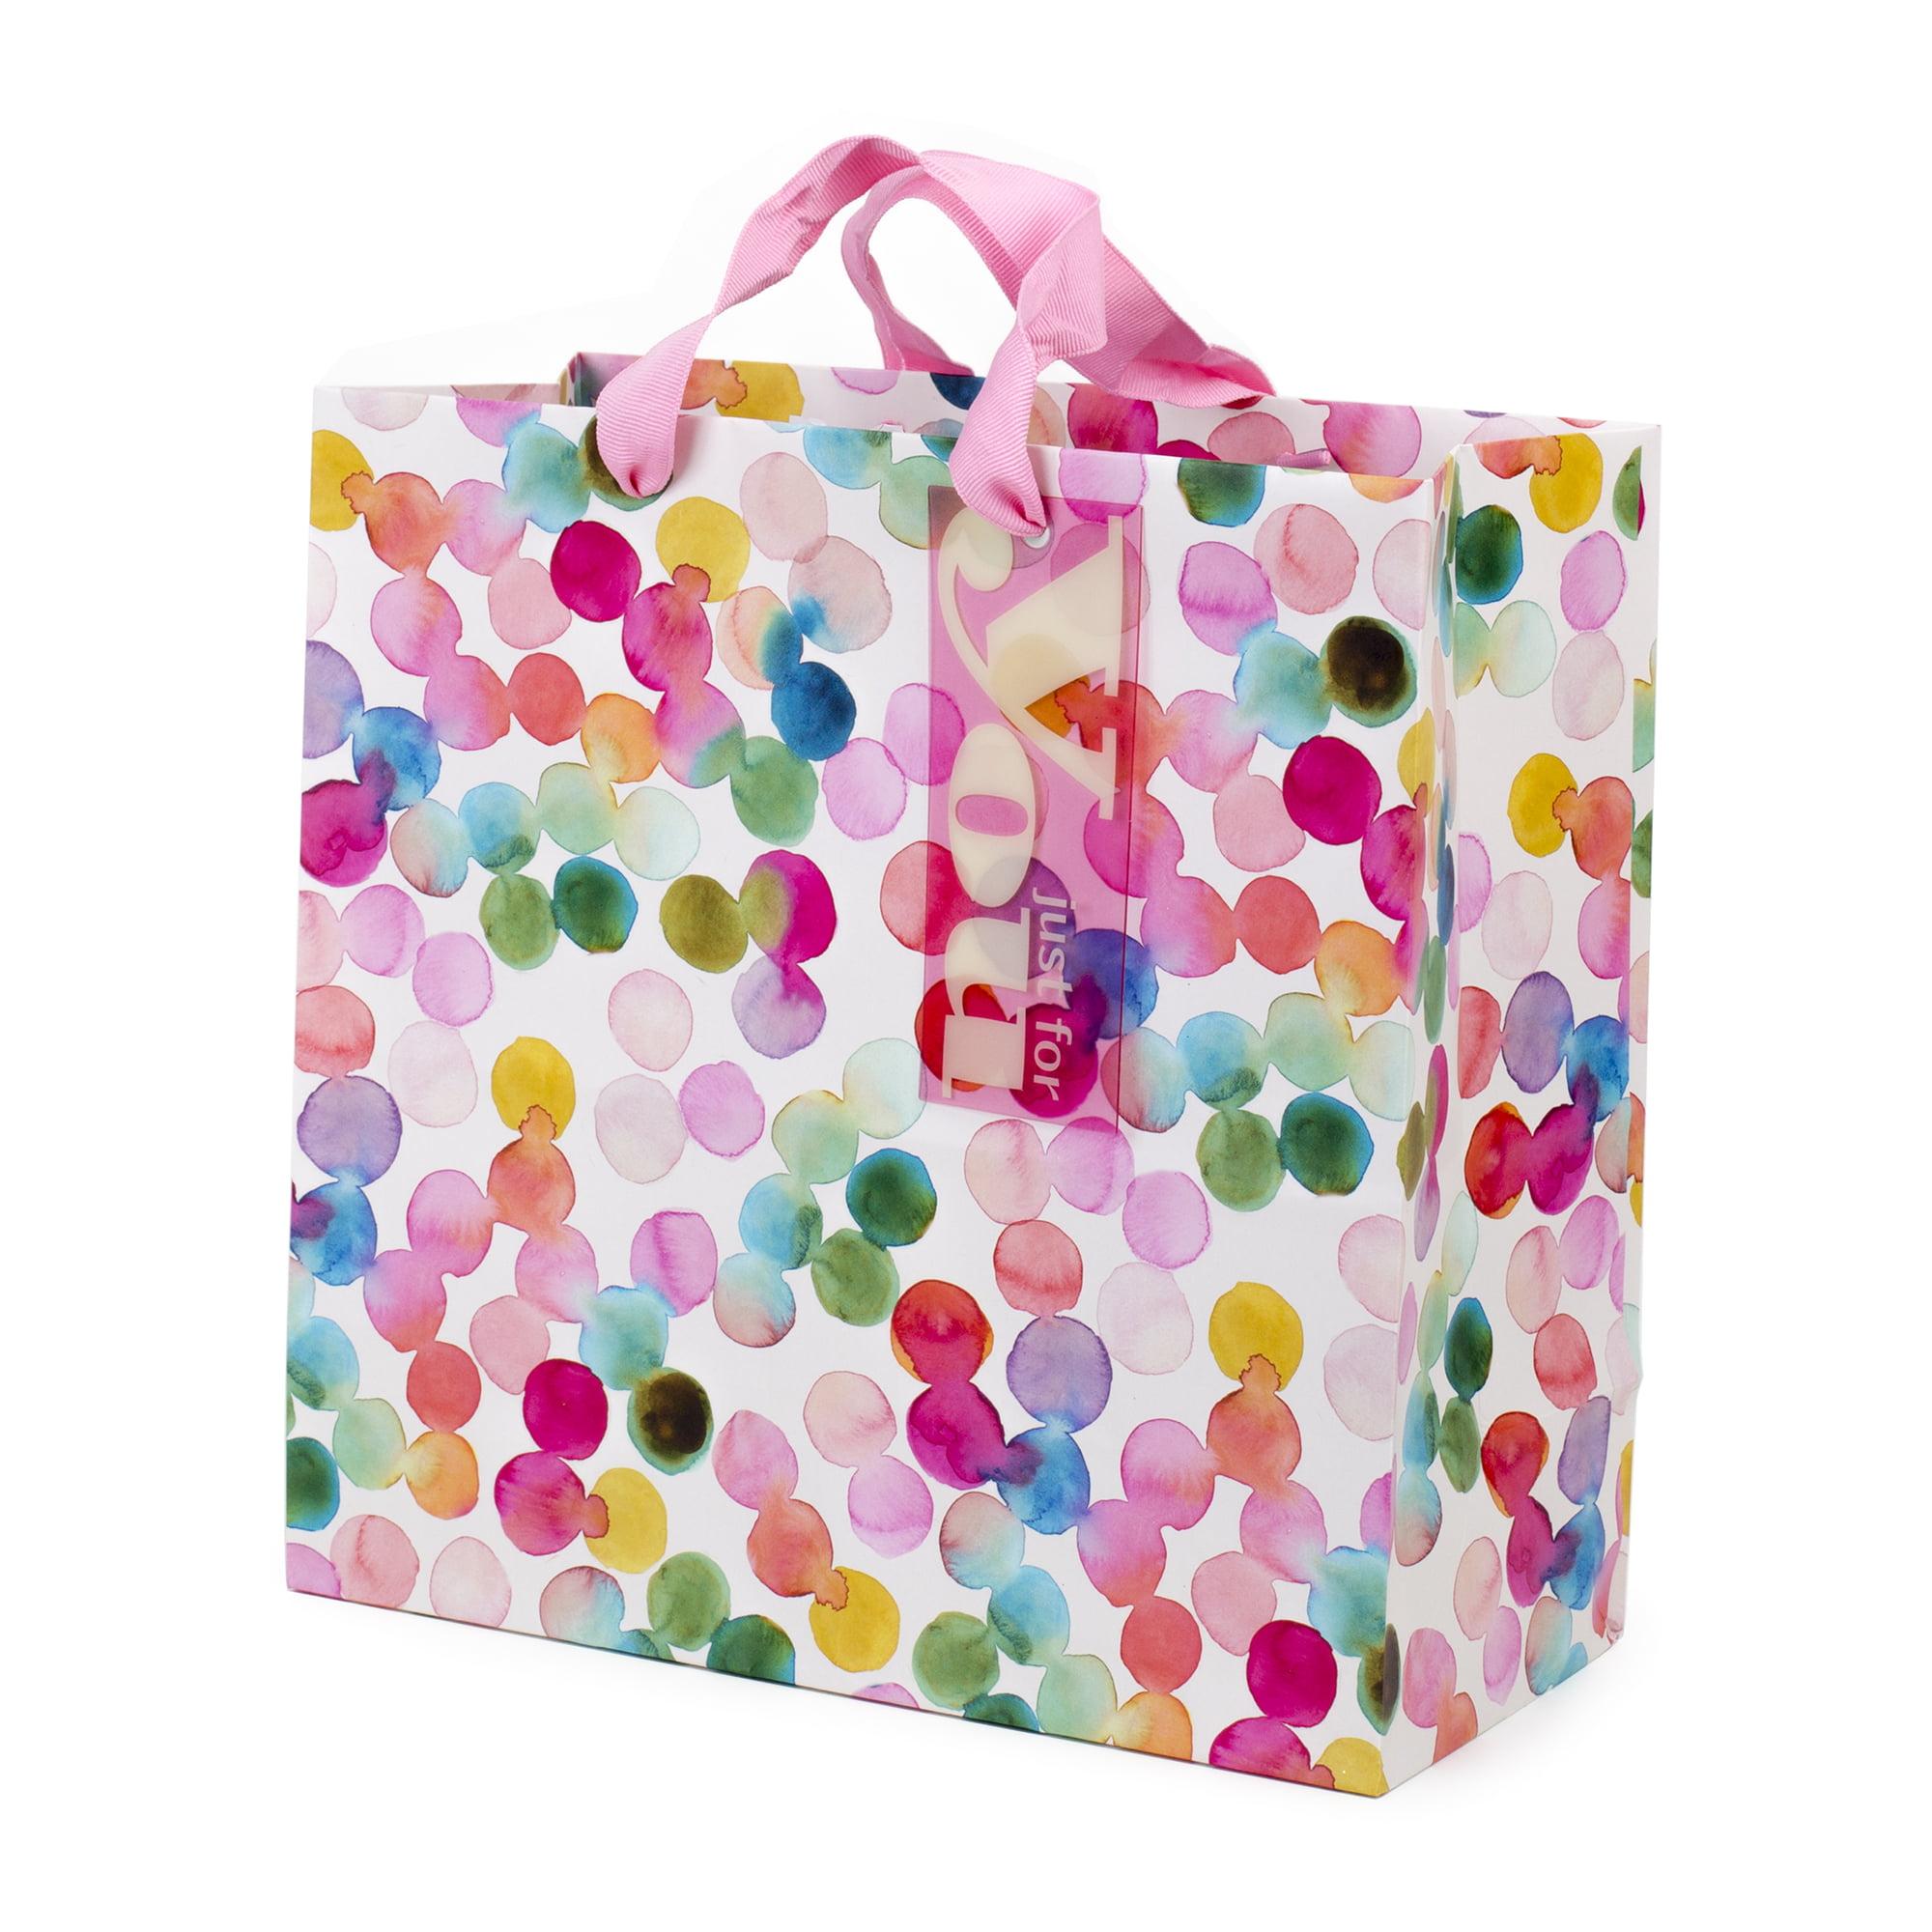 Hallmark, Large Square Gift Bag, Watercolor Dots